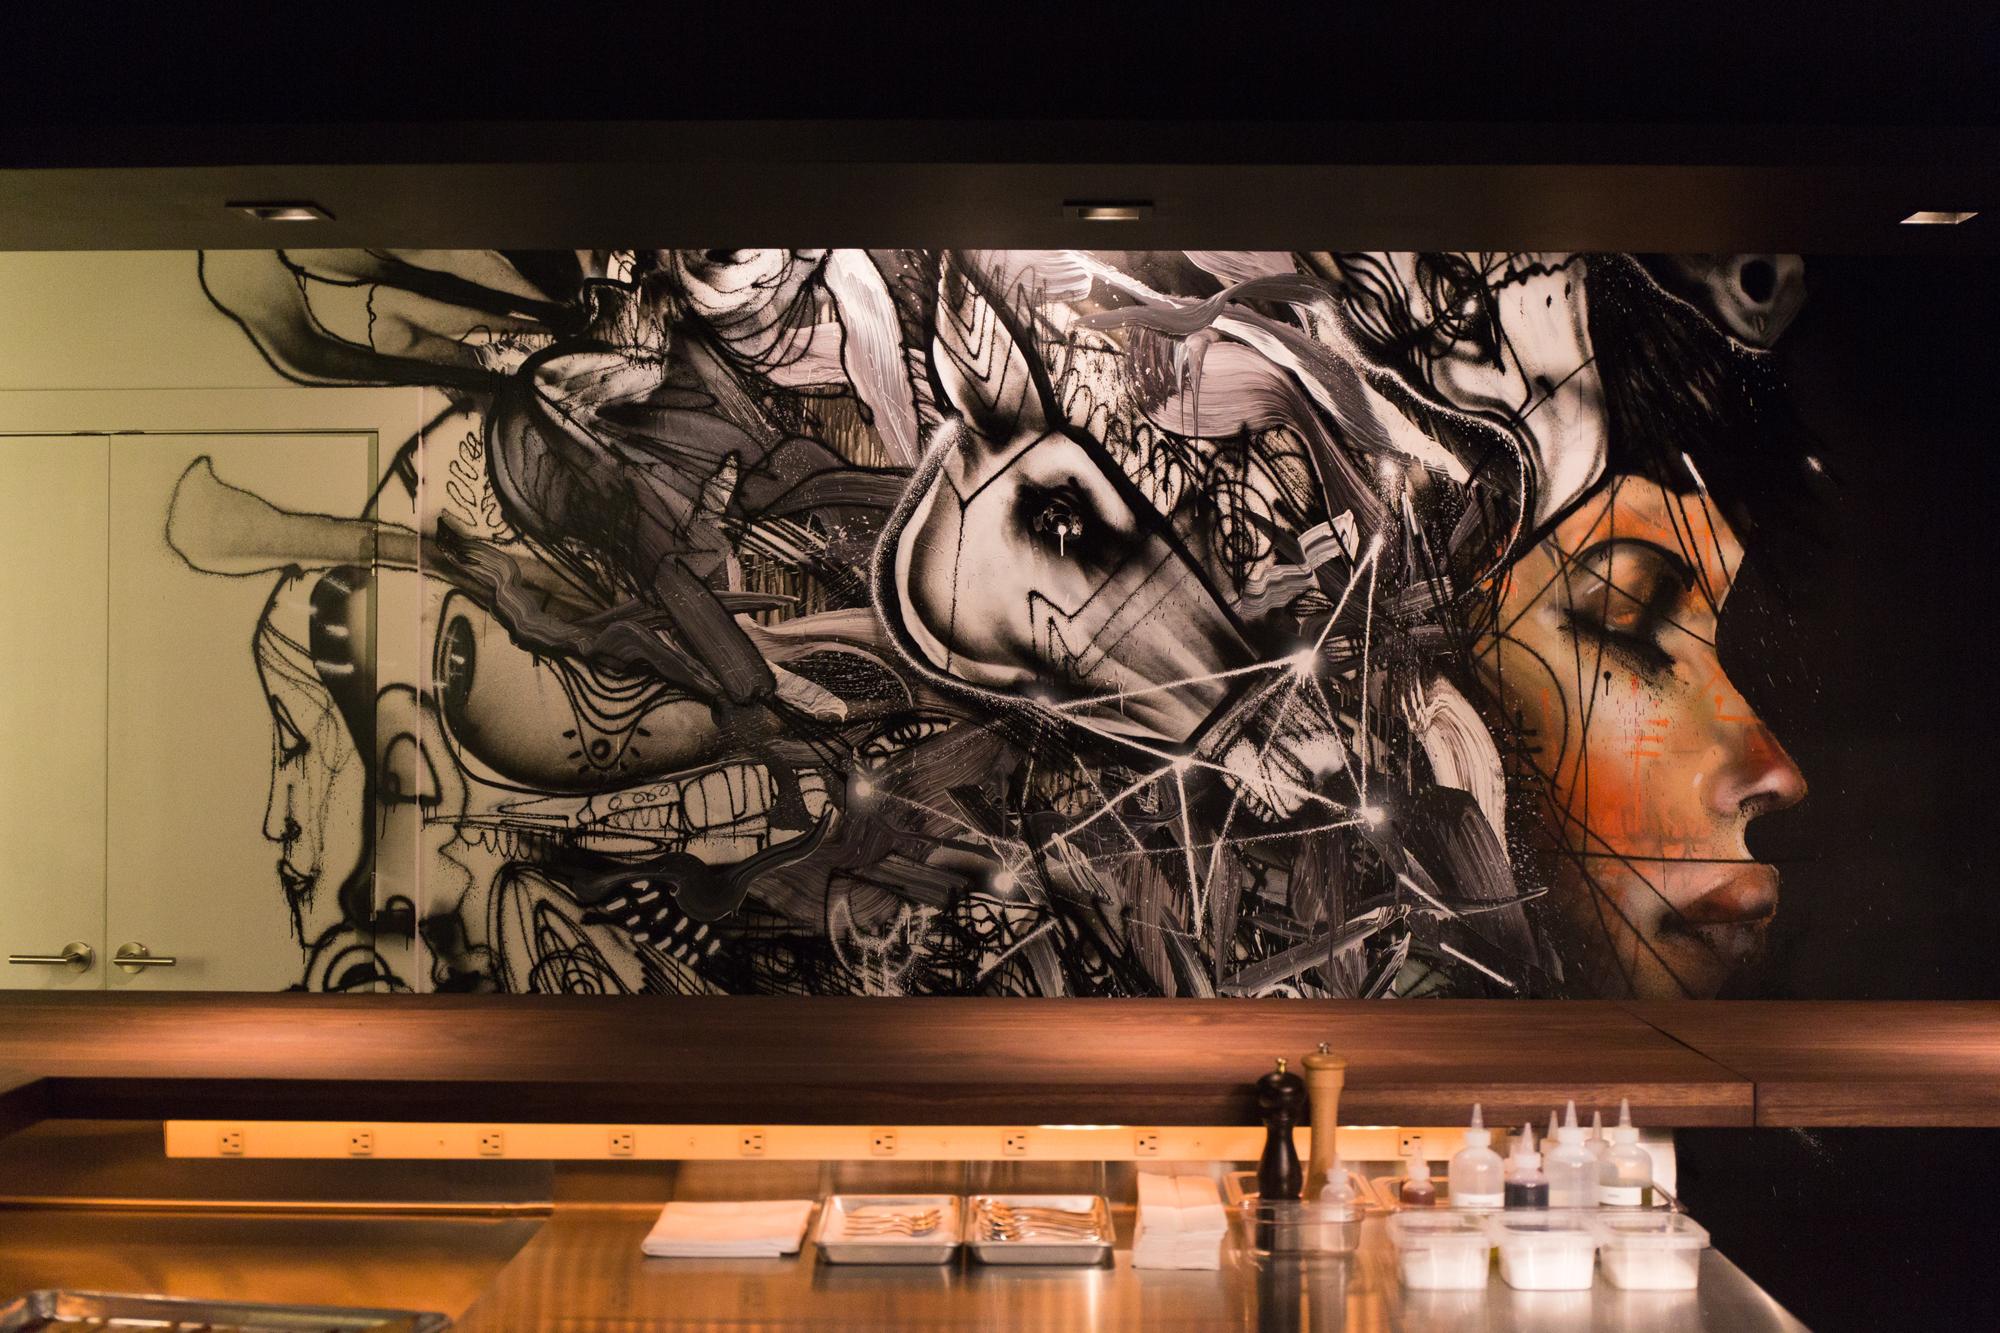 David Choe mural at Momofuku Nishi, New York. Credit: Gabriele Stabile